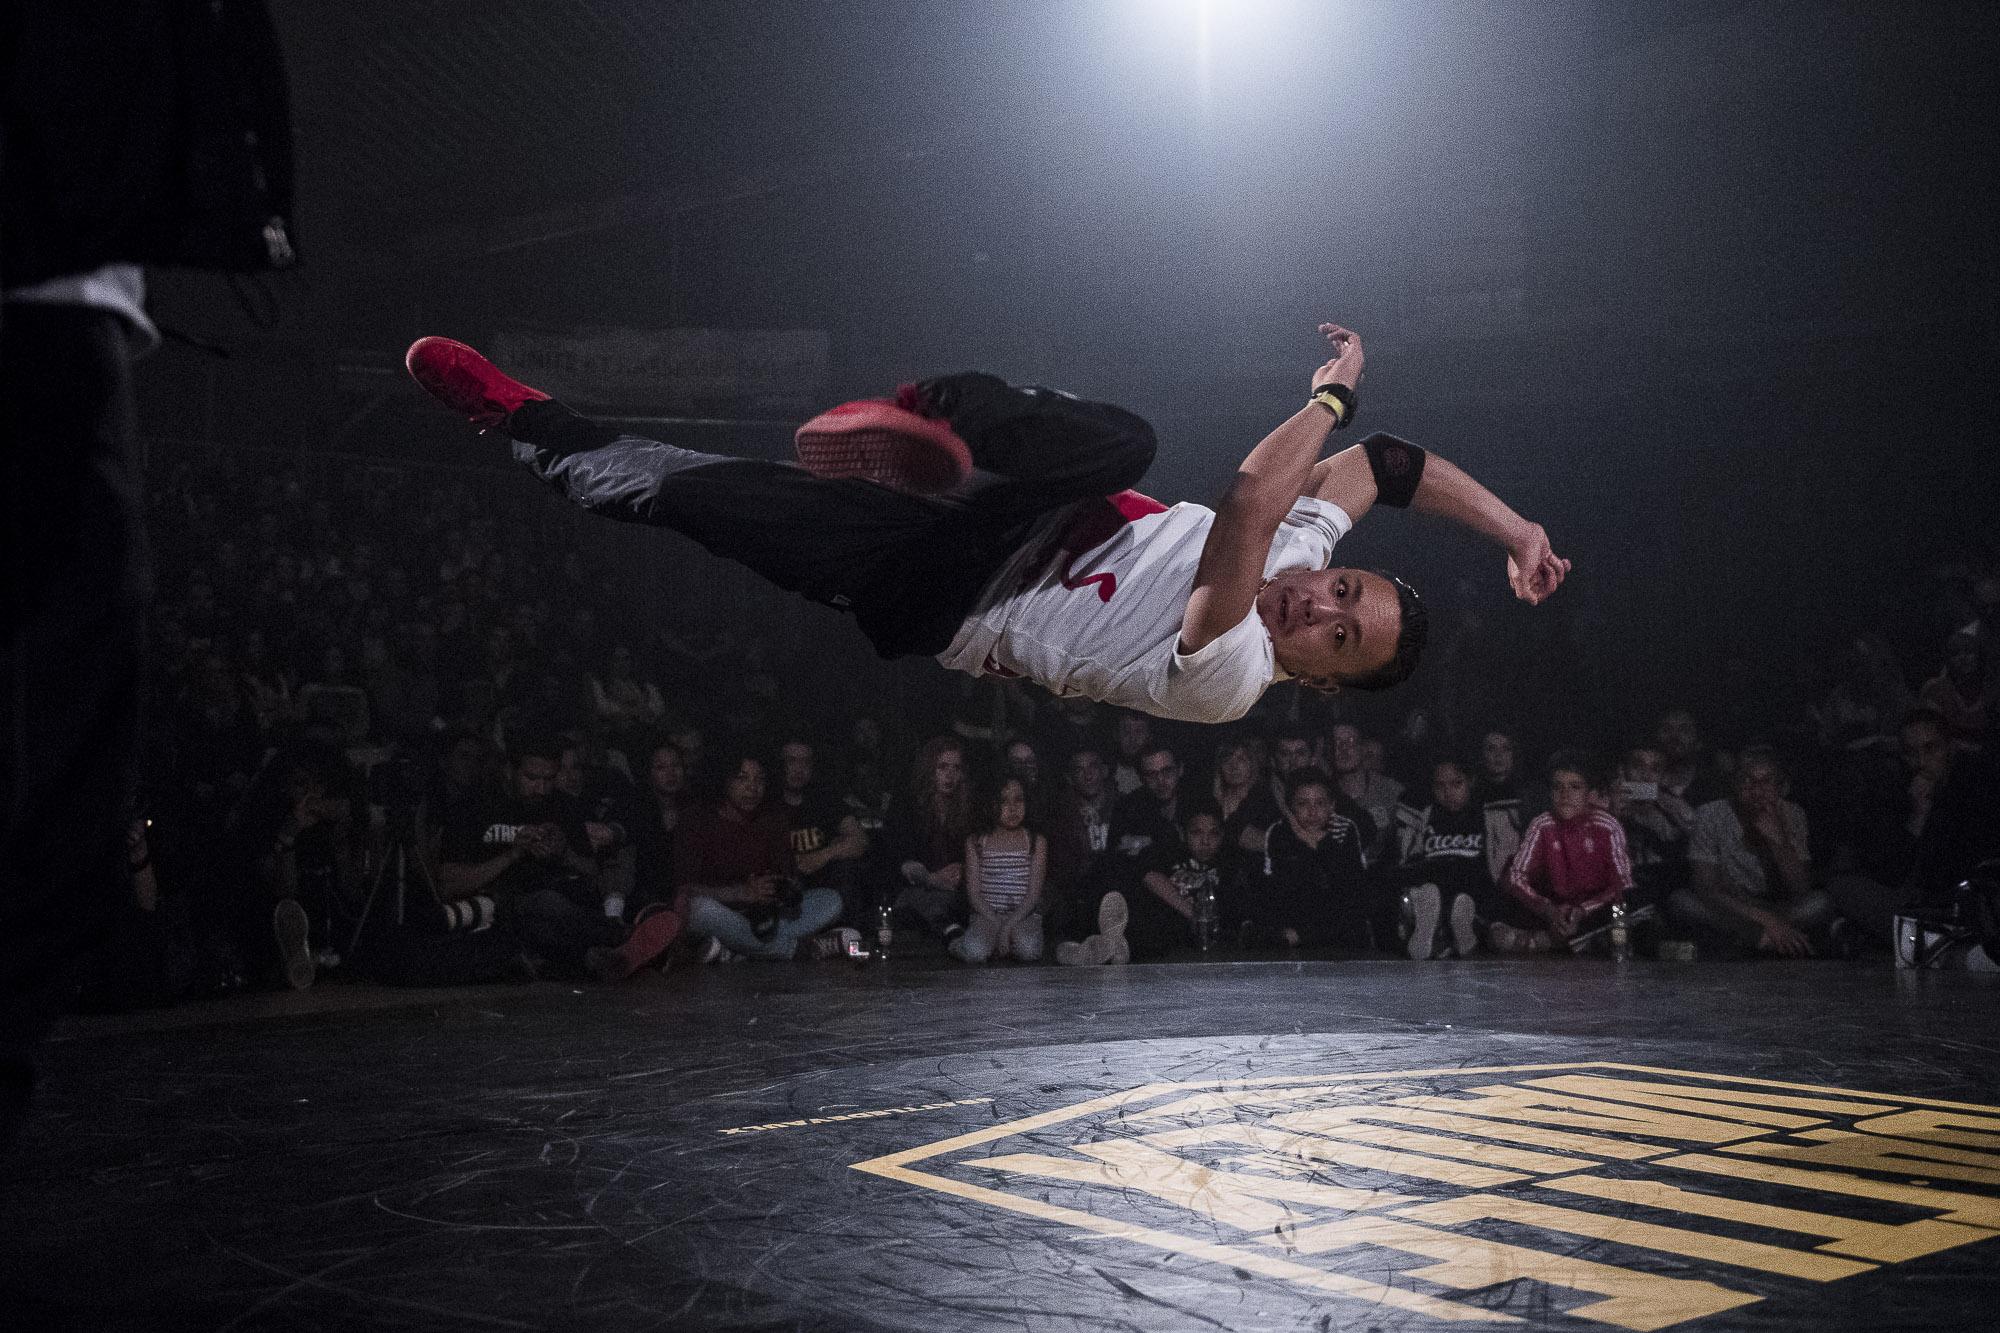 Bboy Taisuke during the Second Round of Battle De Vaulx Against Hustle Kidz 2